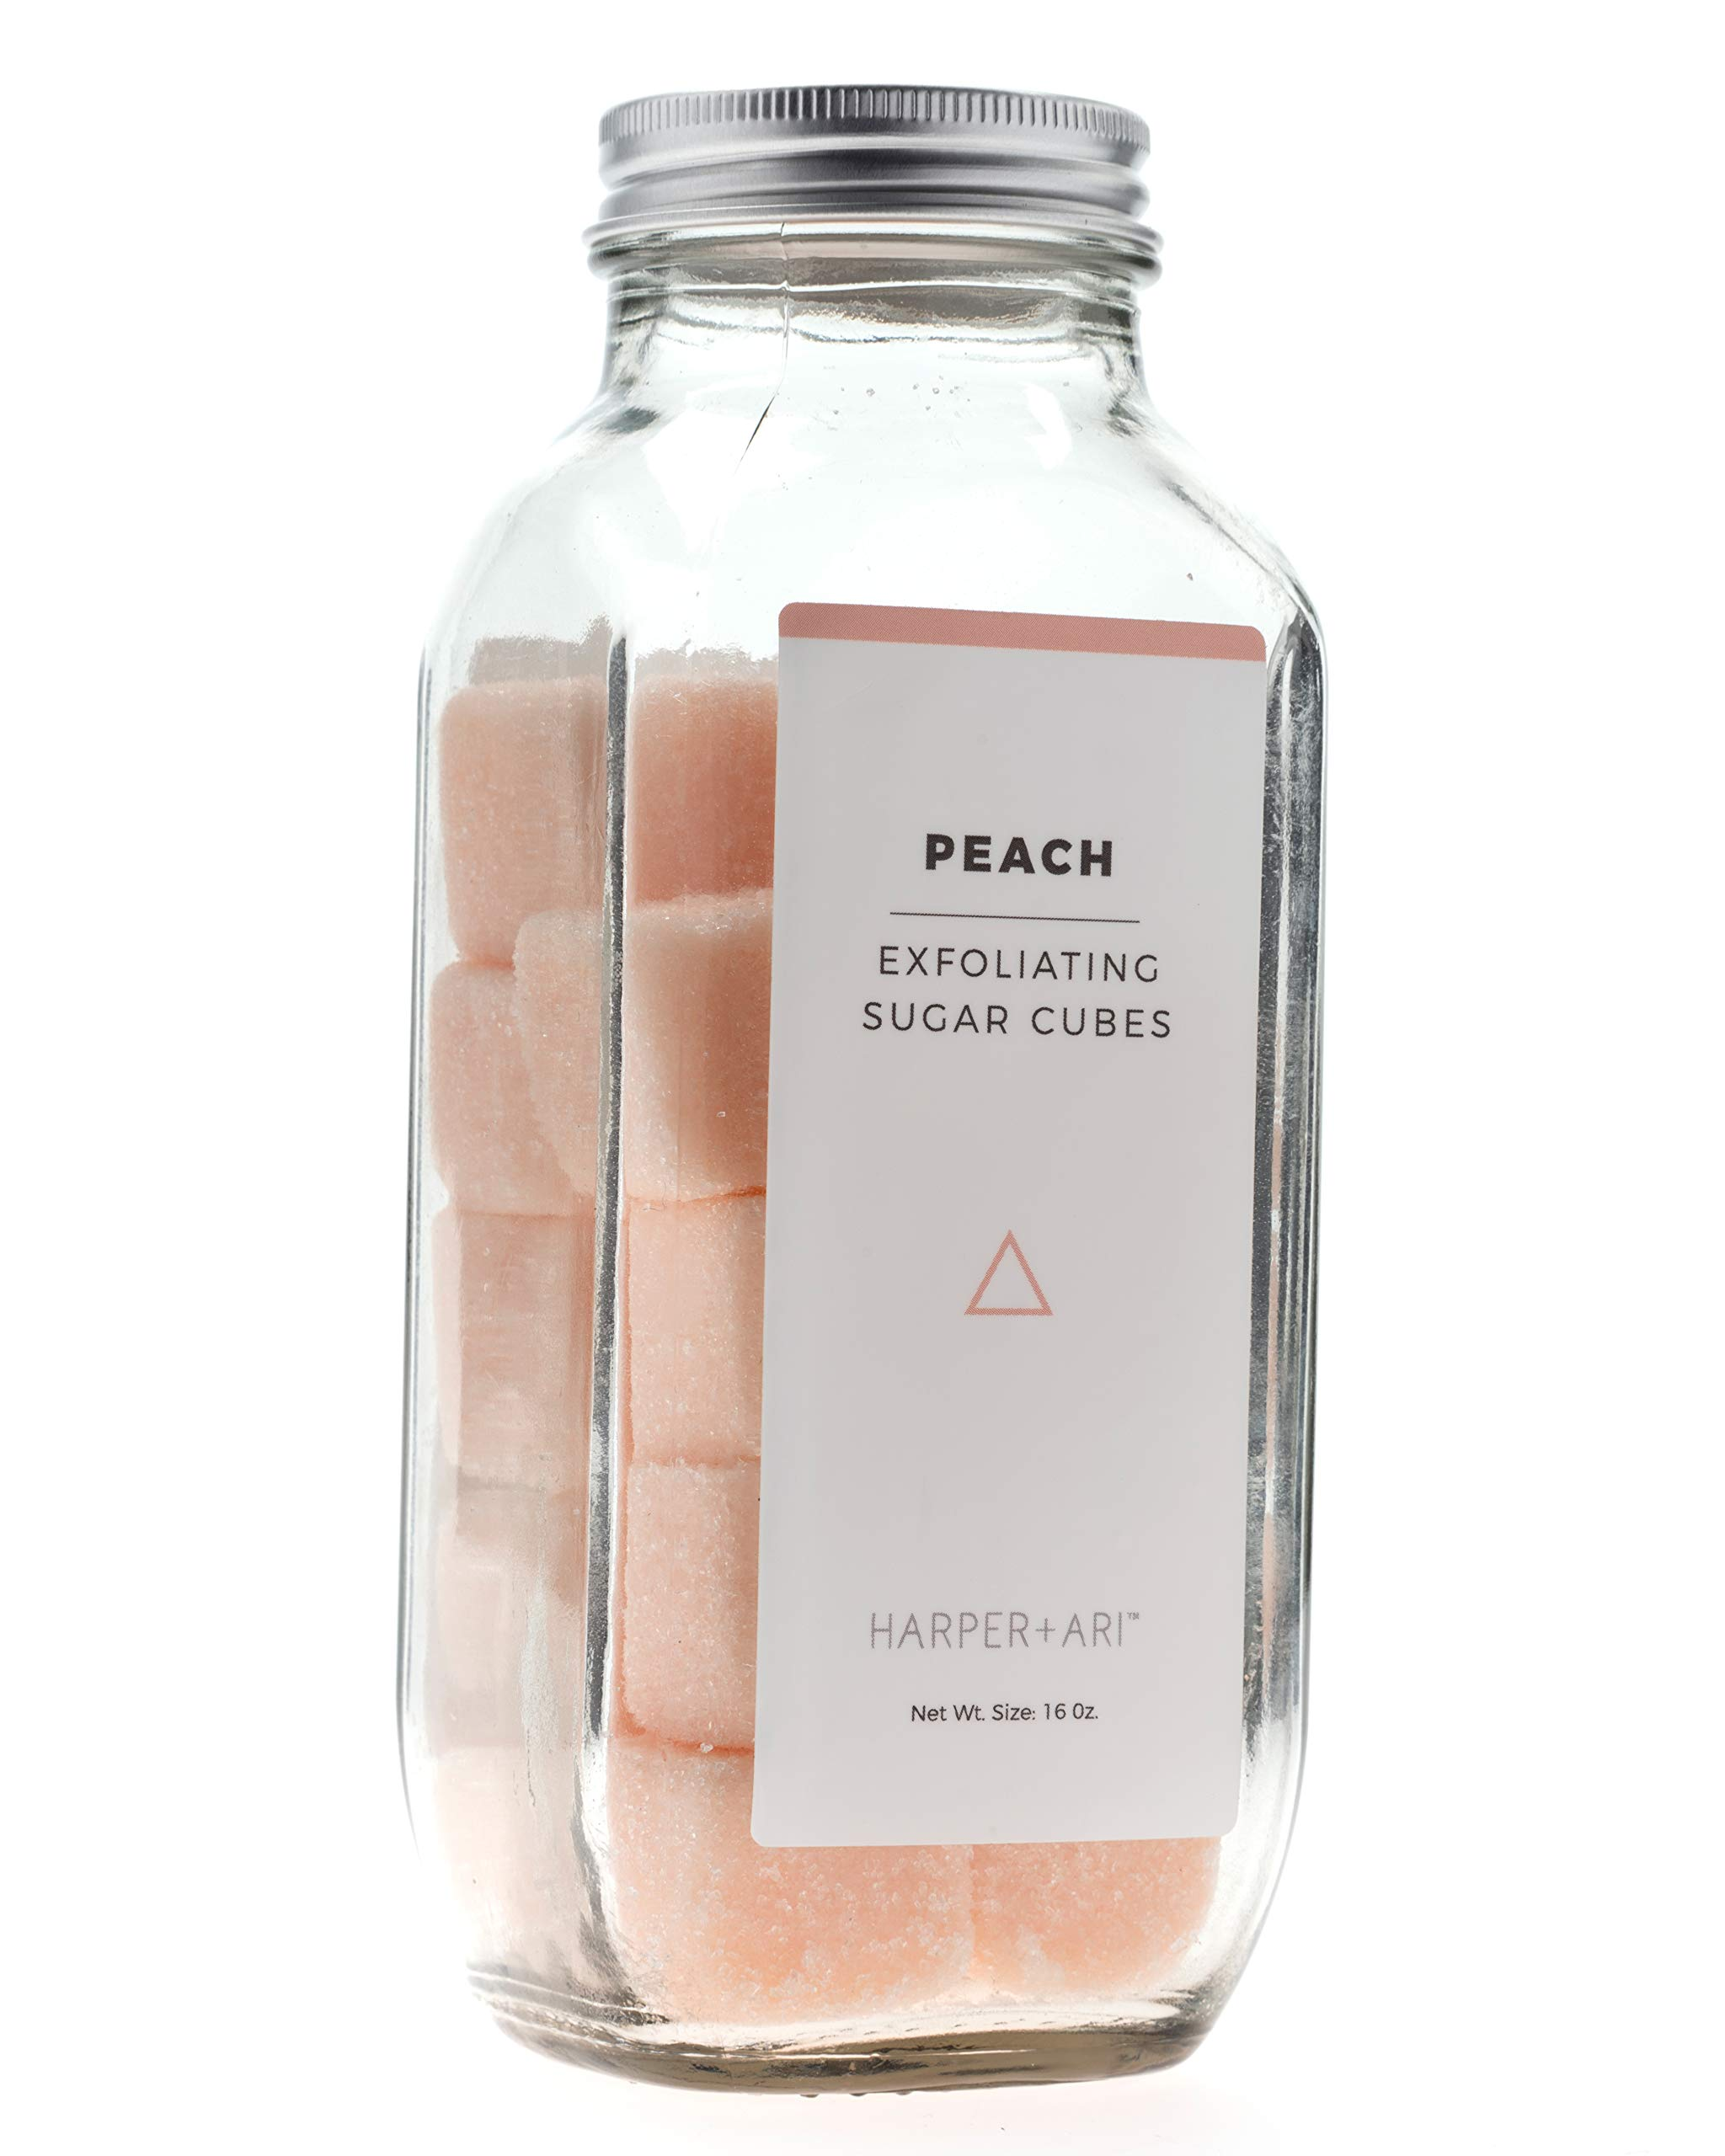 Harper + Ari Sugar Scrub Cubes, Exfoliating Body Scrub in Single Use Size, Soften and Smooth Skin with Shea Butter and Aloe Vera (Peach), 18 Individual Cubes, 16 oz